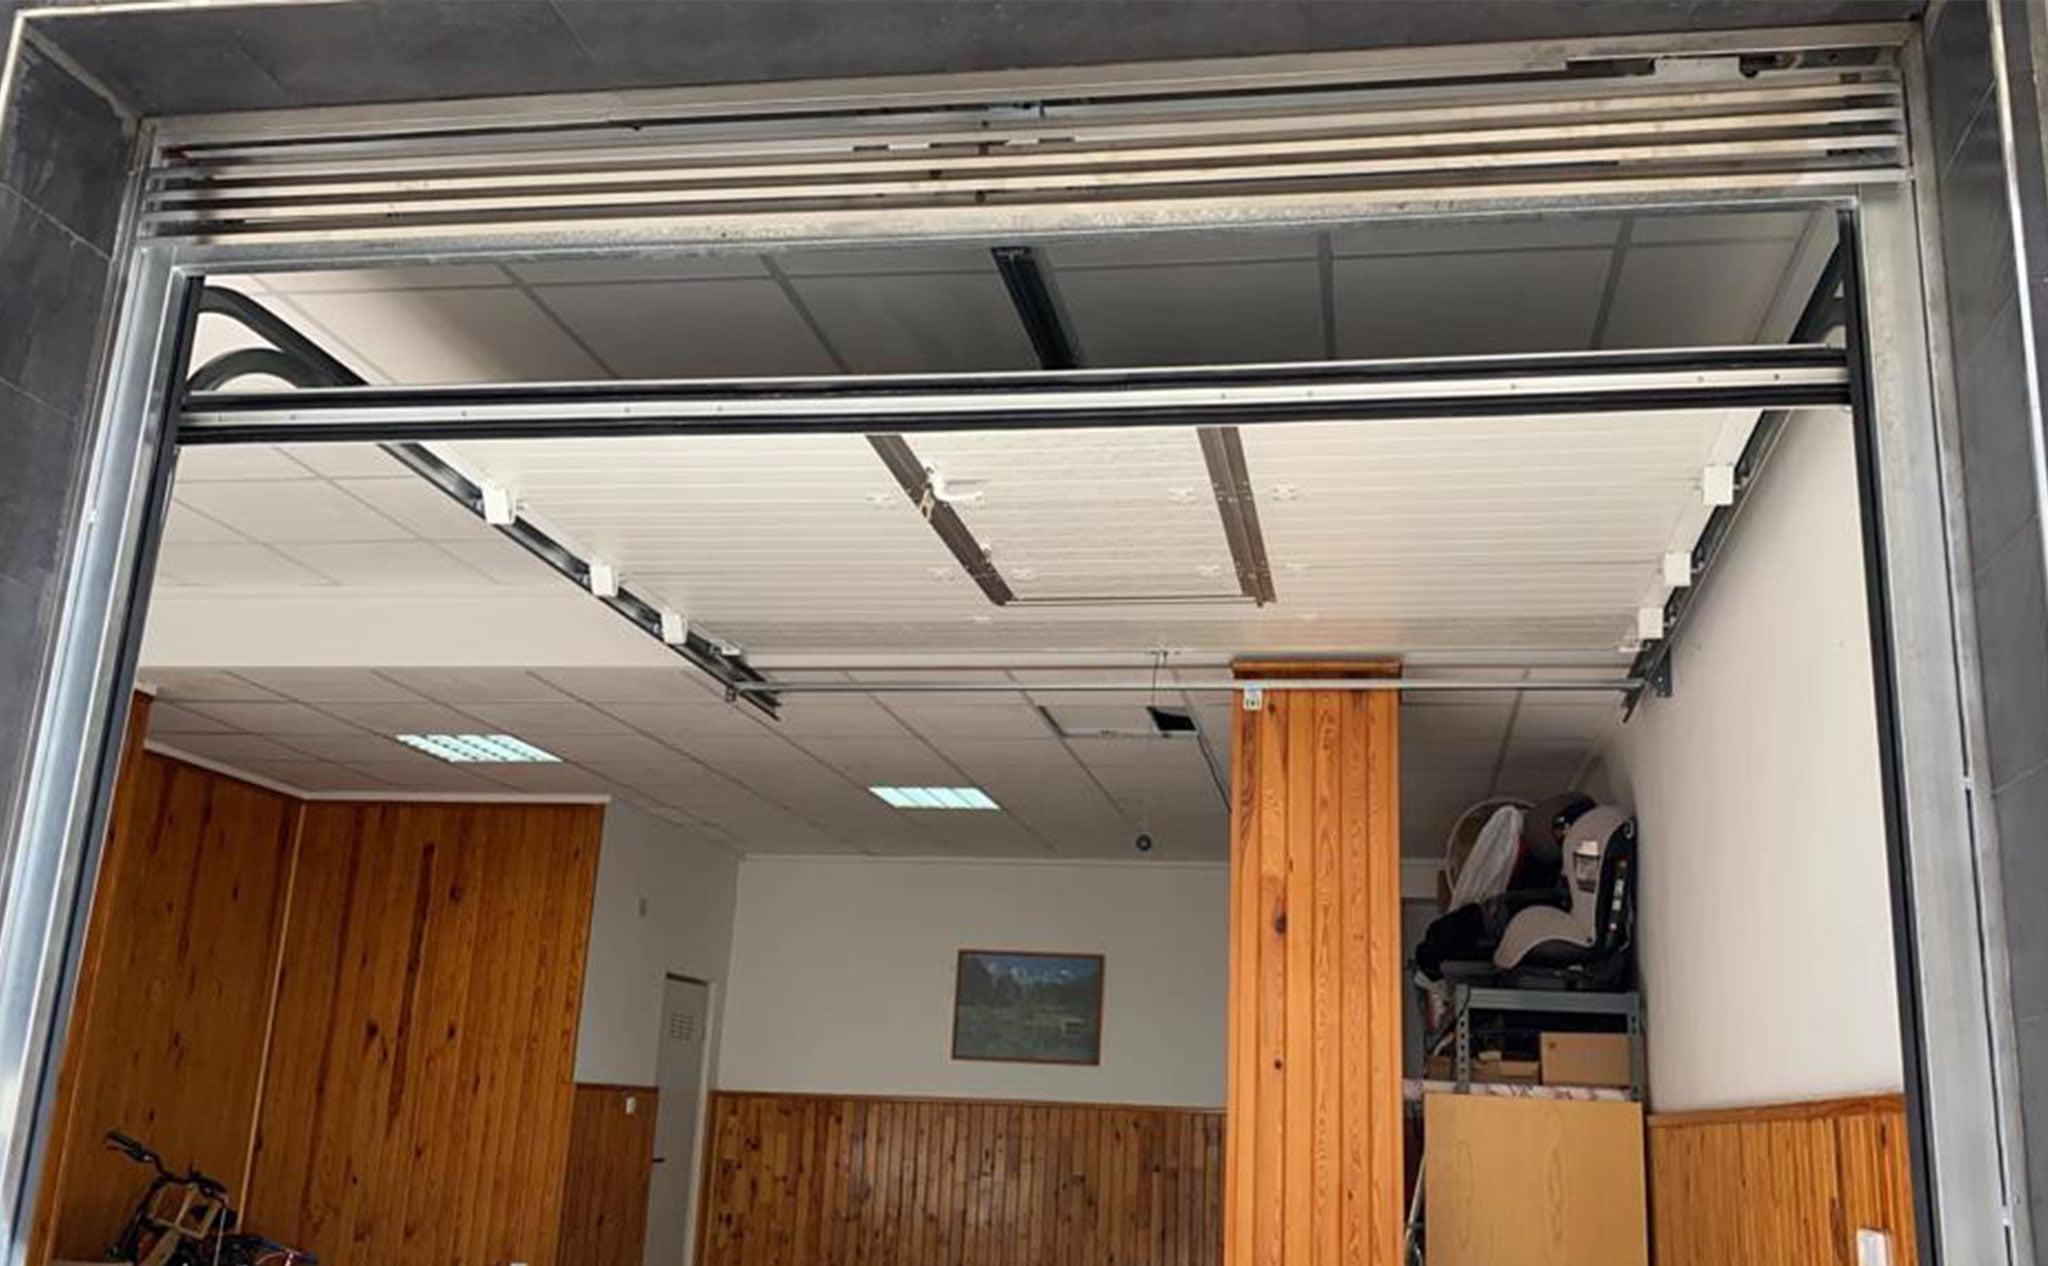 Puerta seccional en un garaje en Dénia – Alucardona PVC y Aluminios S.L.